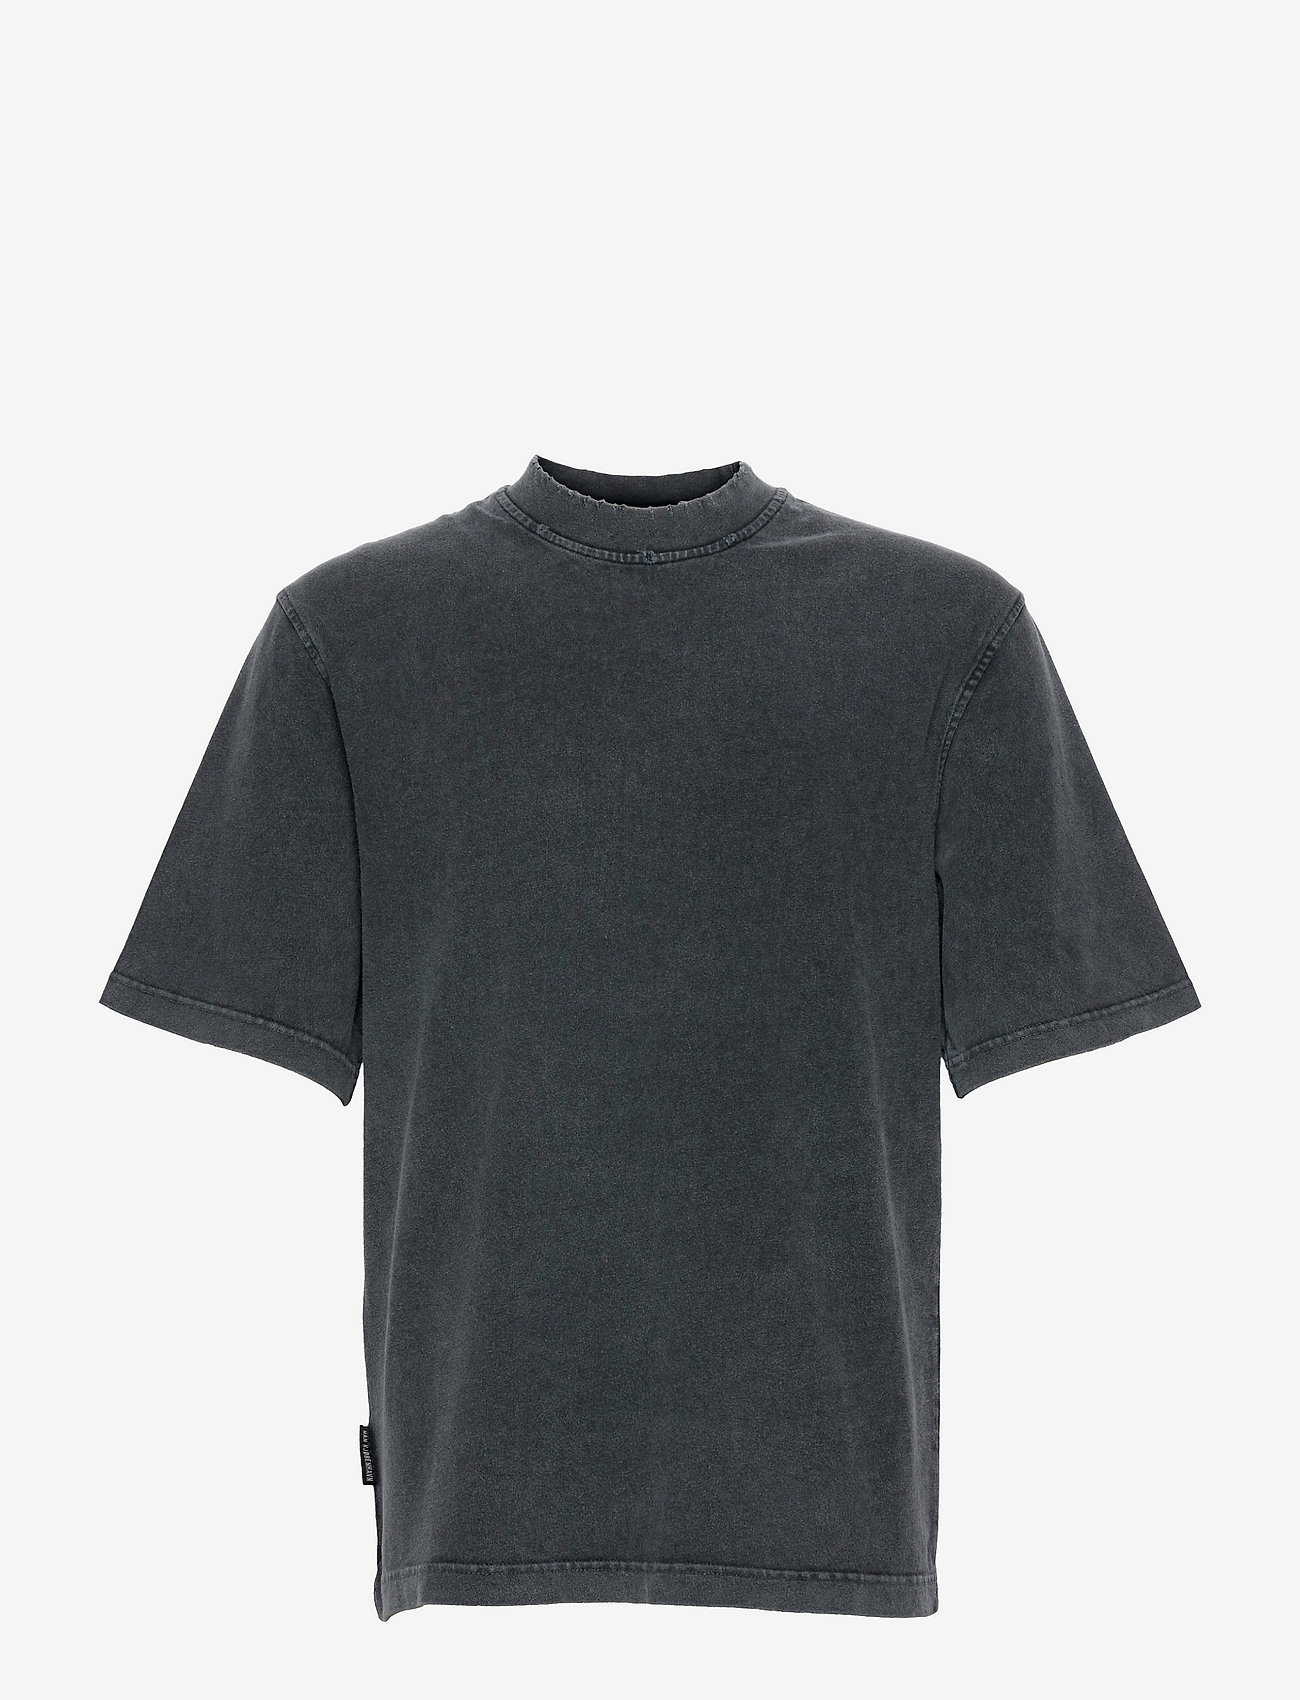 HAN Kjøbenhavn - Distressed Tee Short Sleeve - basic t-shirts - distressed dark grey - 0